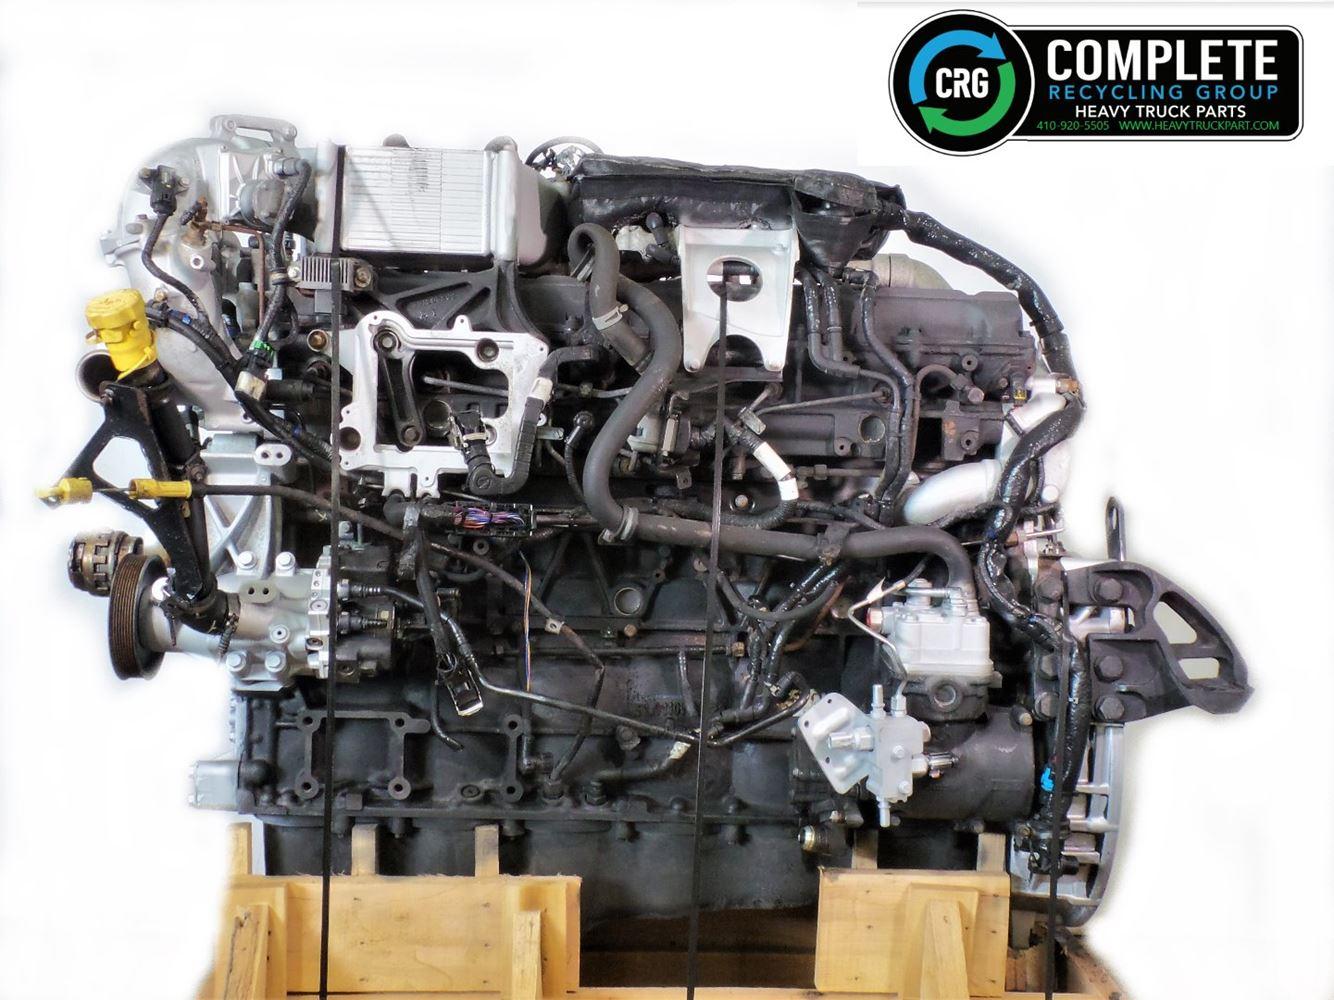 2011 INTERNATIONAL MAXXFORCE 11 ENGINE ASSEMBLY TRUCK PARTS #679788